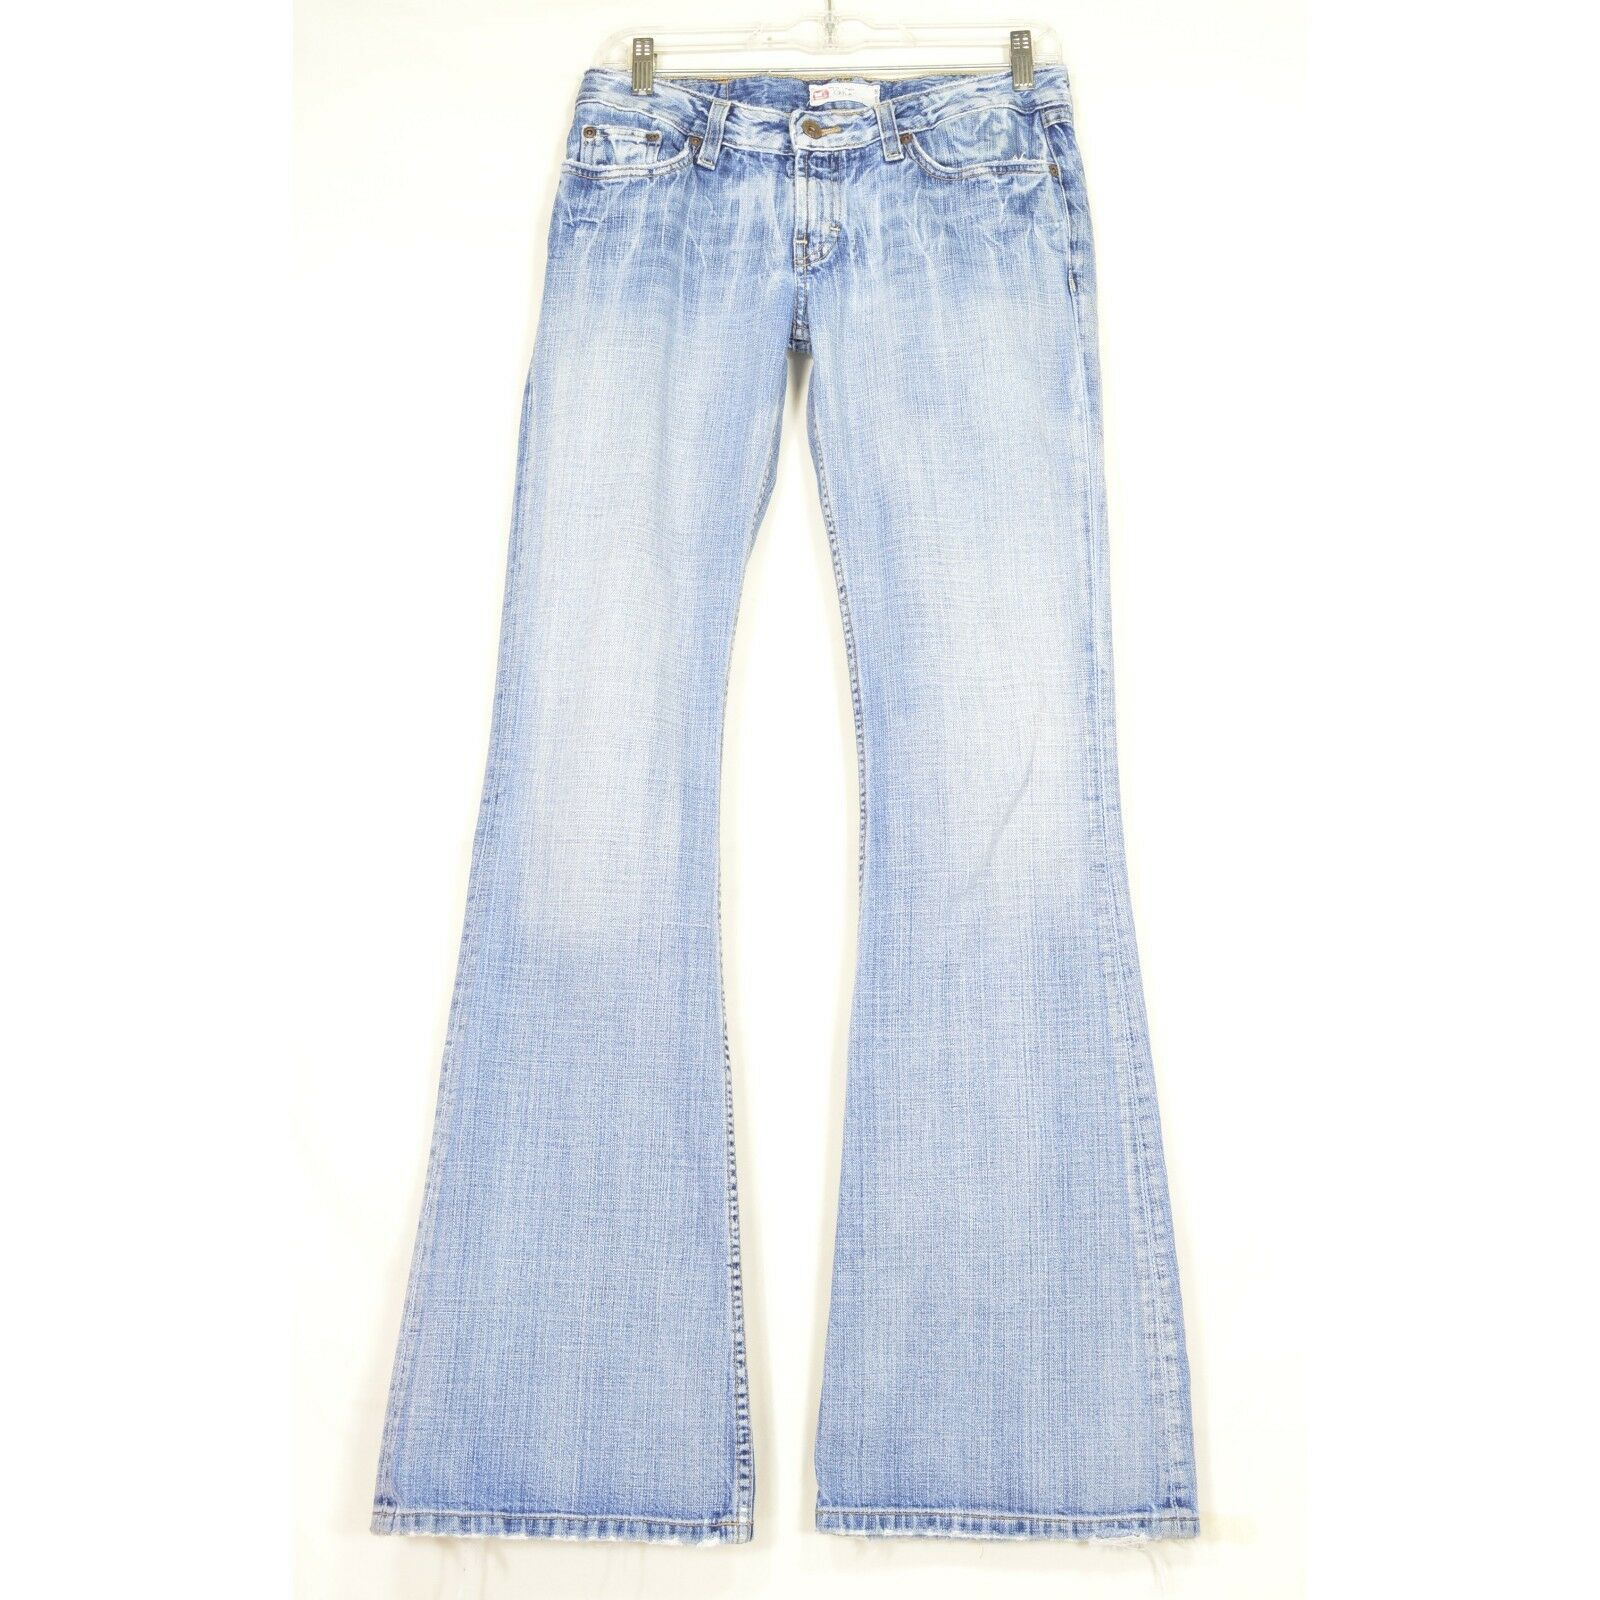 BKE jeans 28 x 35.5 Element straight leg flare bell bottom hippie boho distresse